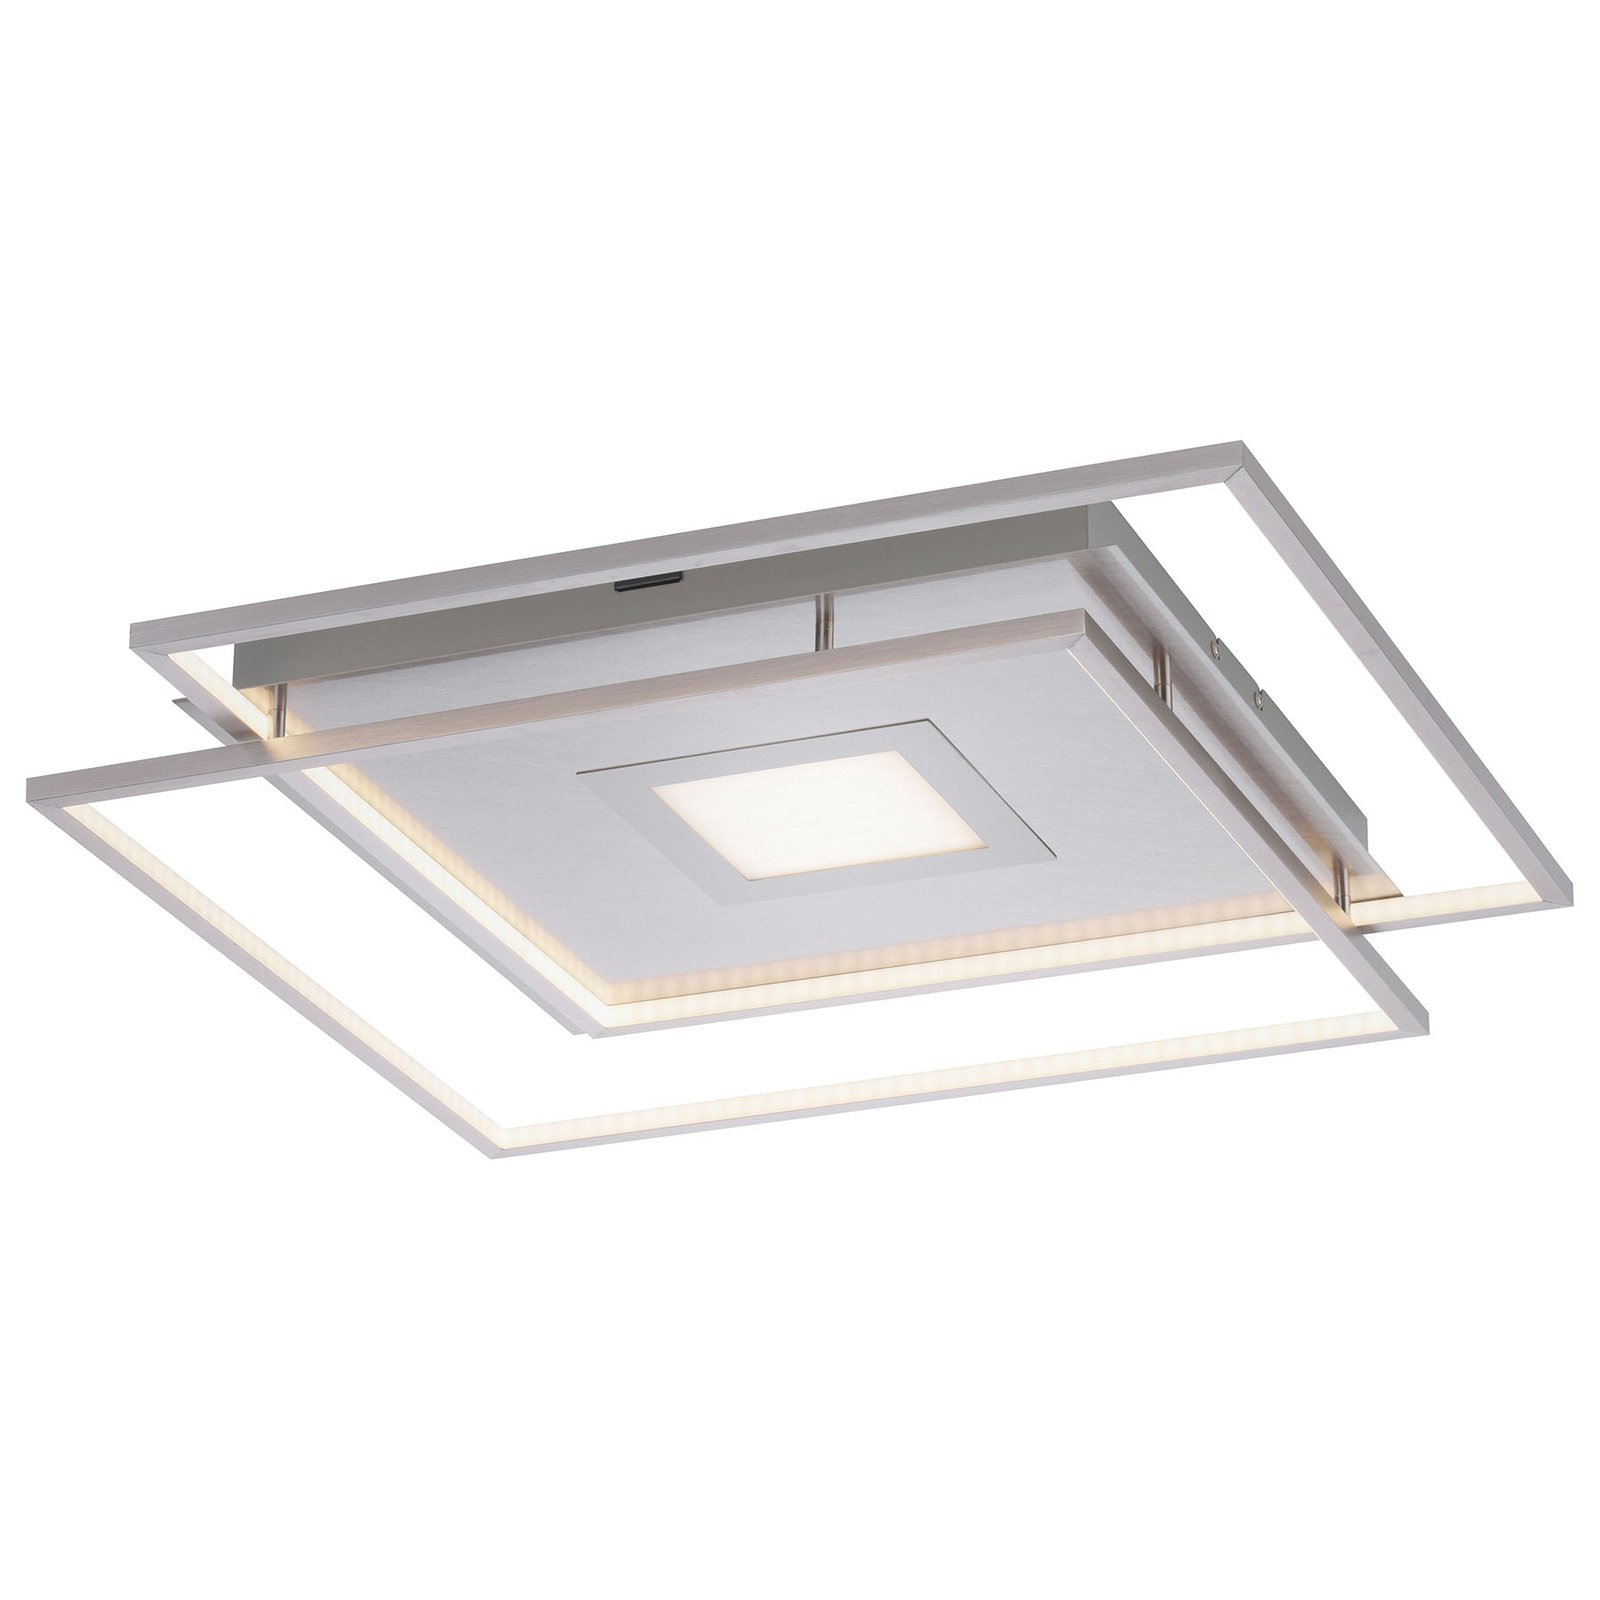 Paul Neuhaus Q-AMIRA LED-taklampe sølv